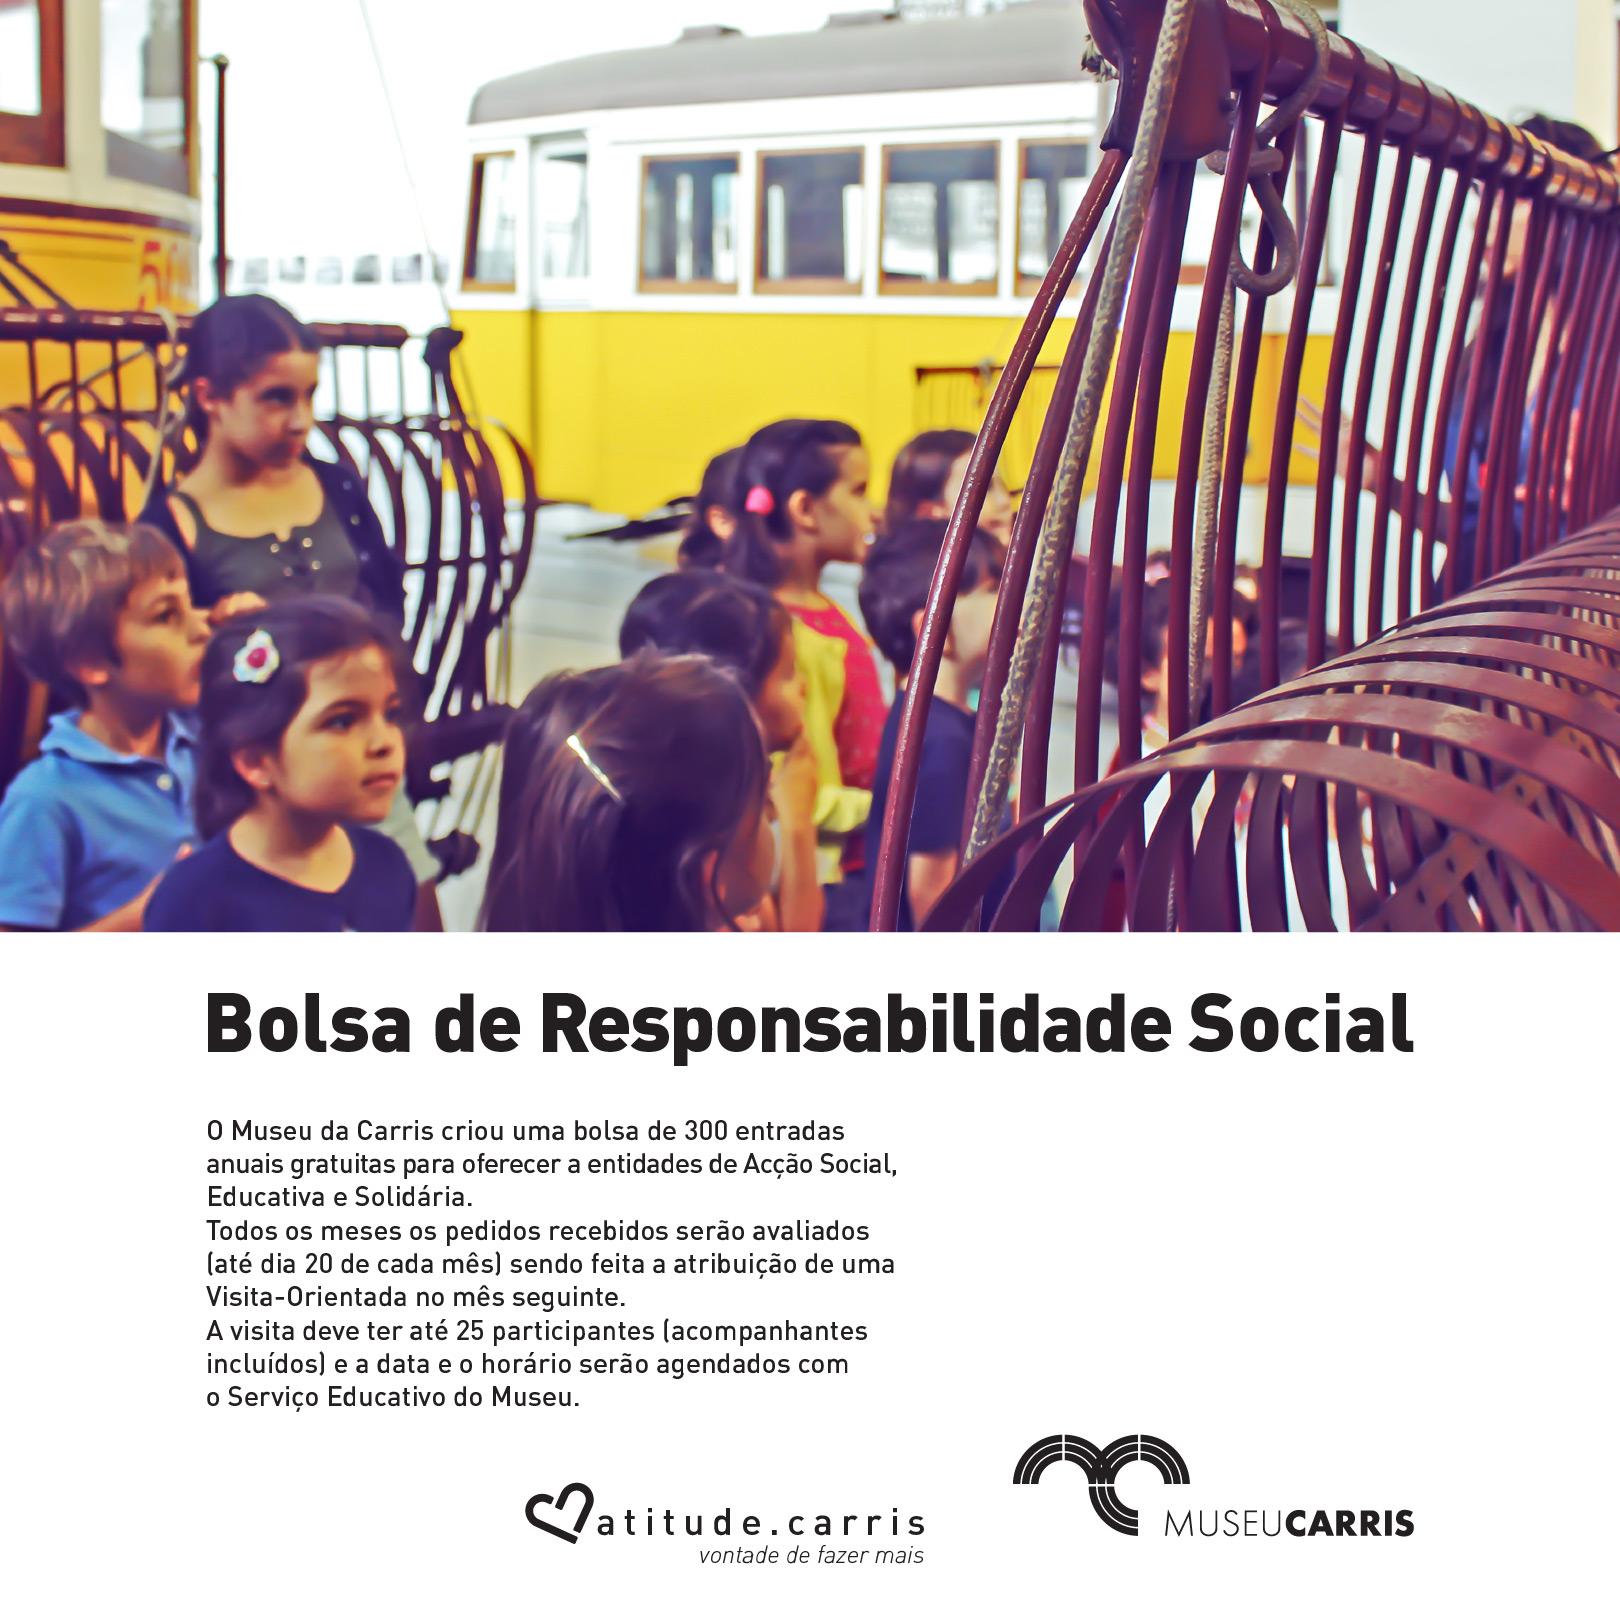 Bolsa_de_responsabilidade_social[2]